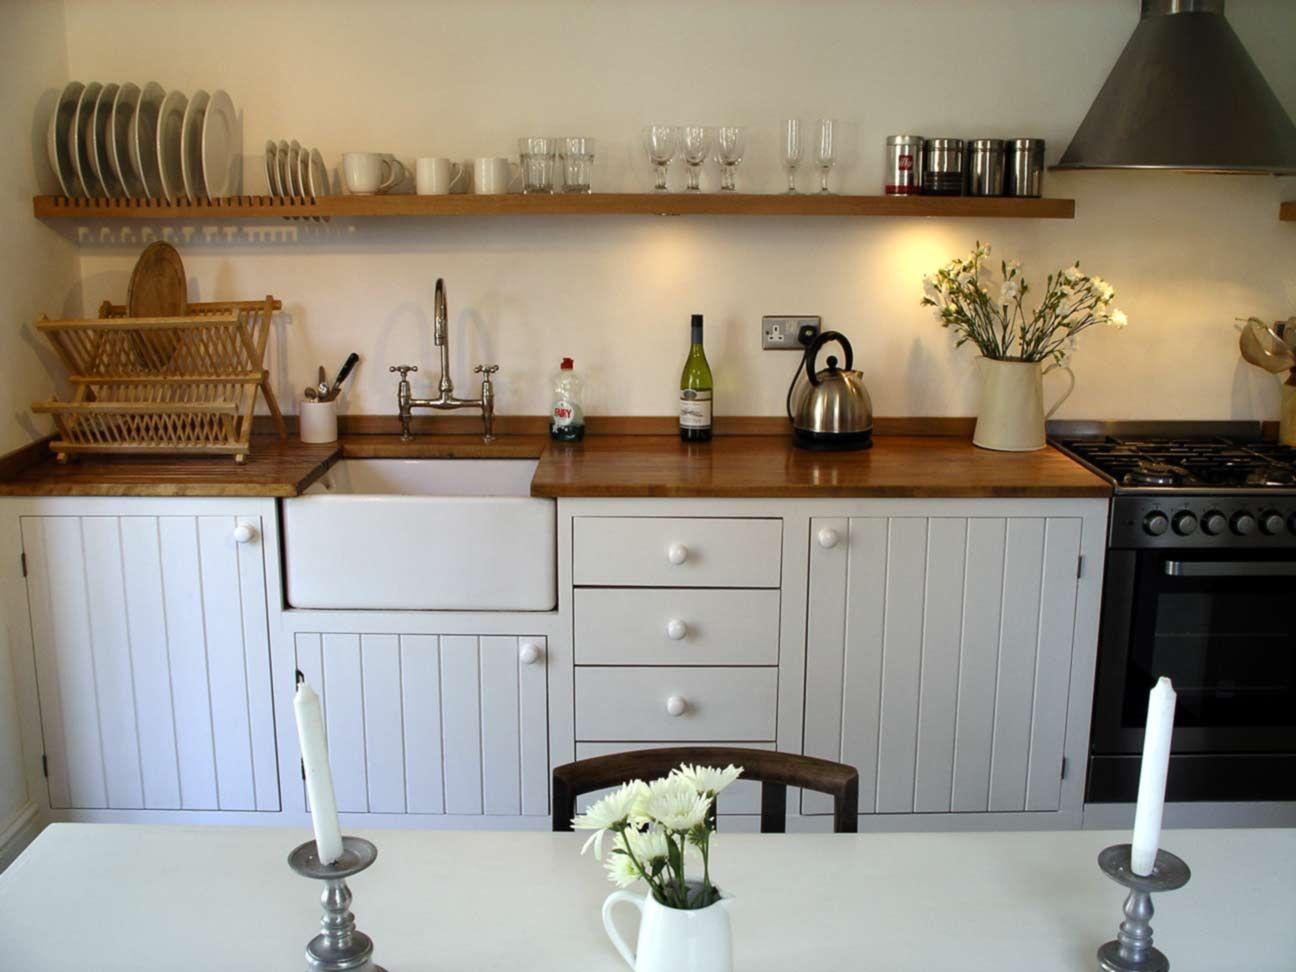 Best Kitchen Gallery: Rustic Kitchen Designs Indoor Outdoor Home Cottage Pinterest of Small Rustic Kitchens on rachelxblog.com